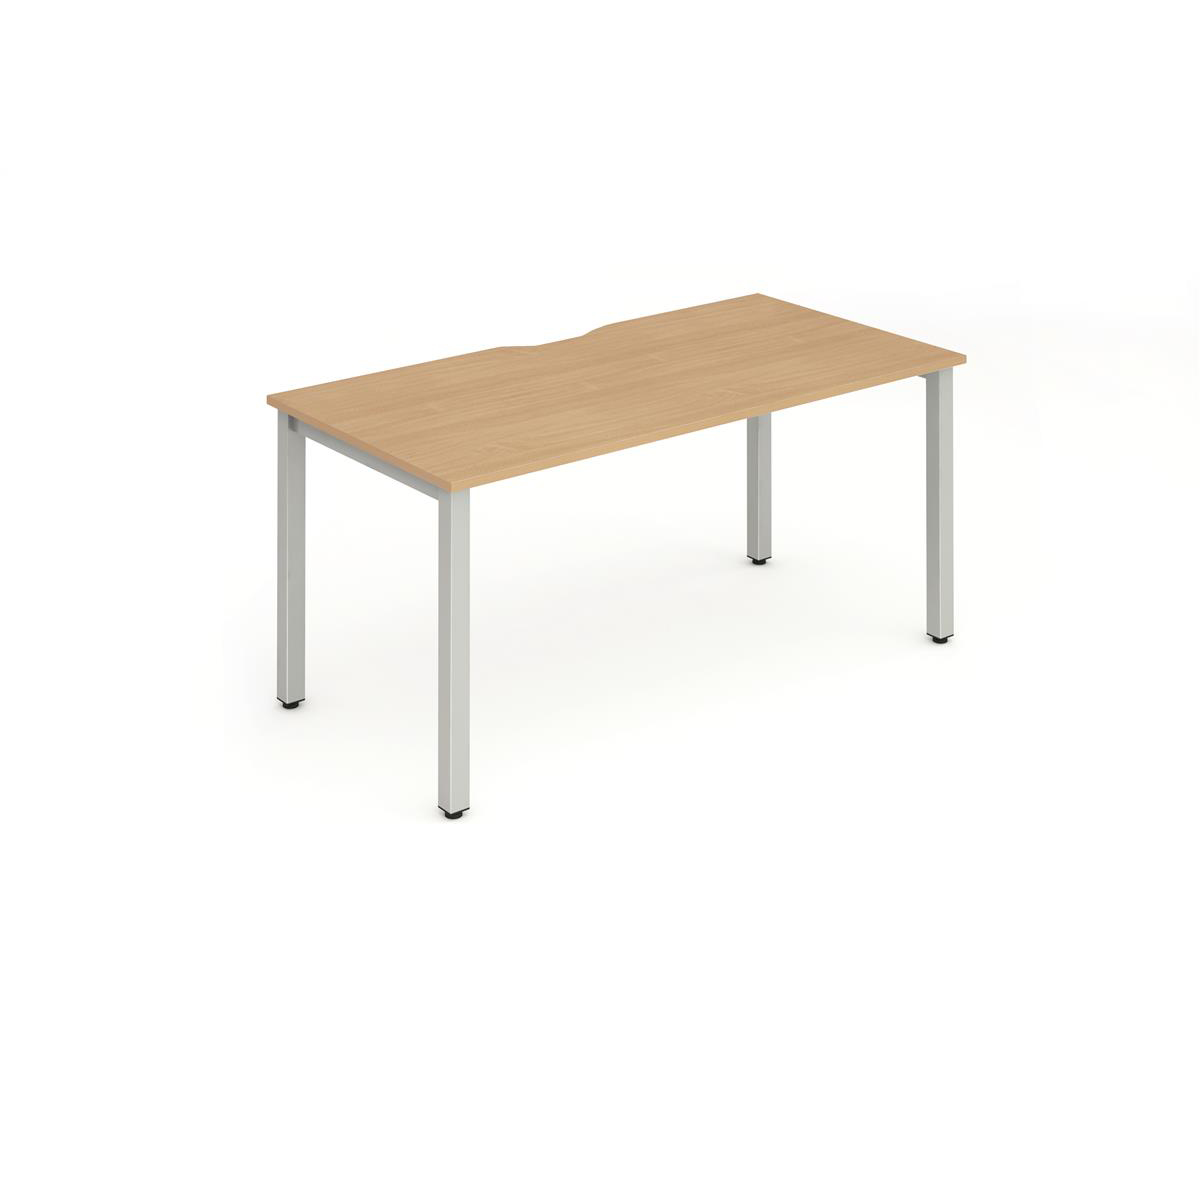 Trexus Bench Desk Individual Silver Leg 1200x800mm Beech Ref BE267